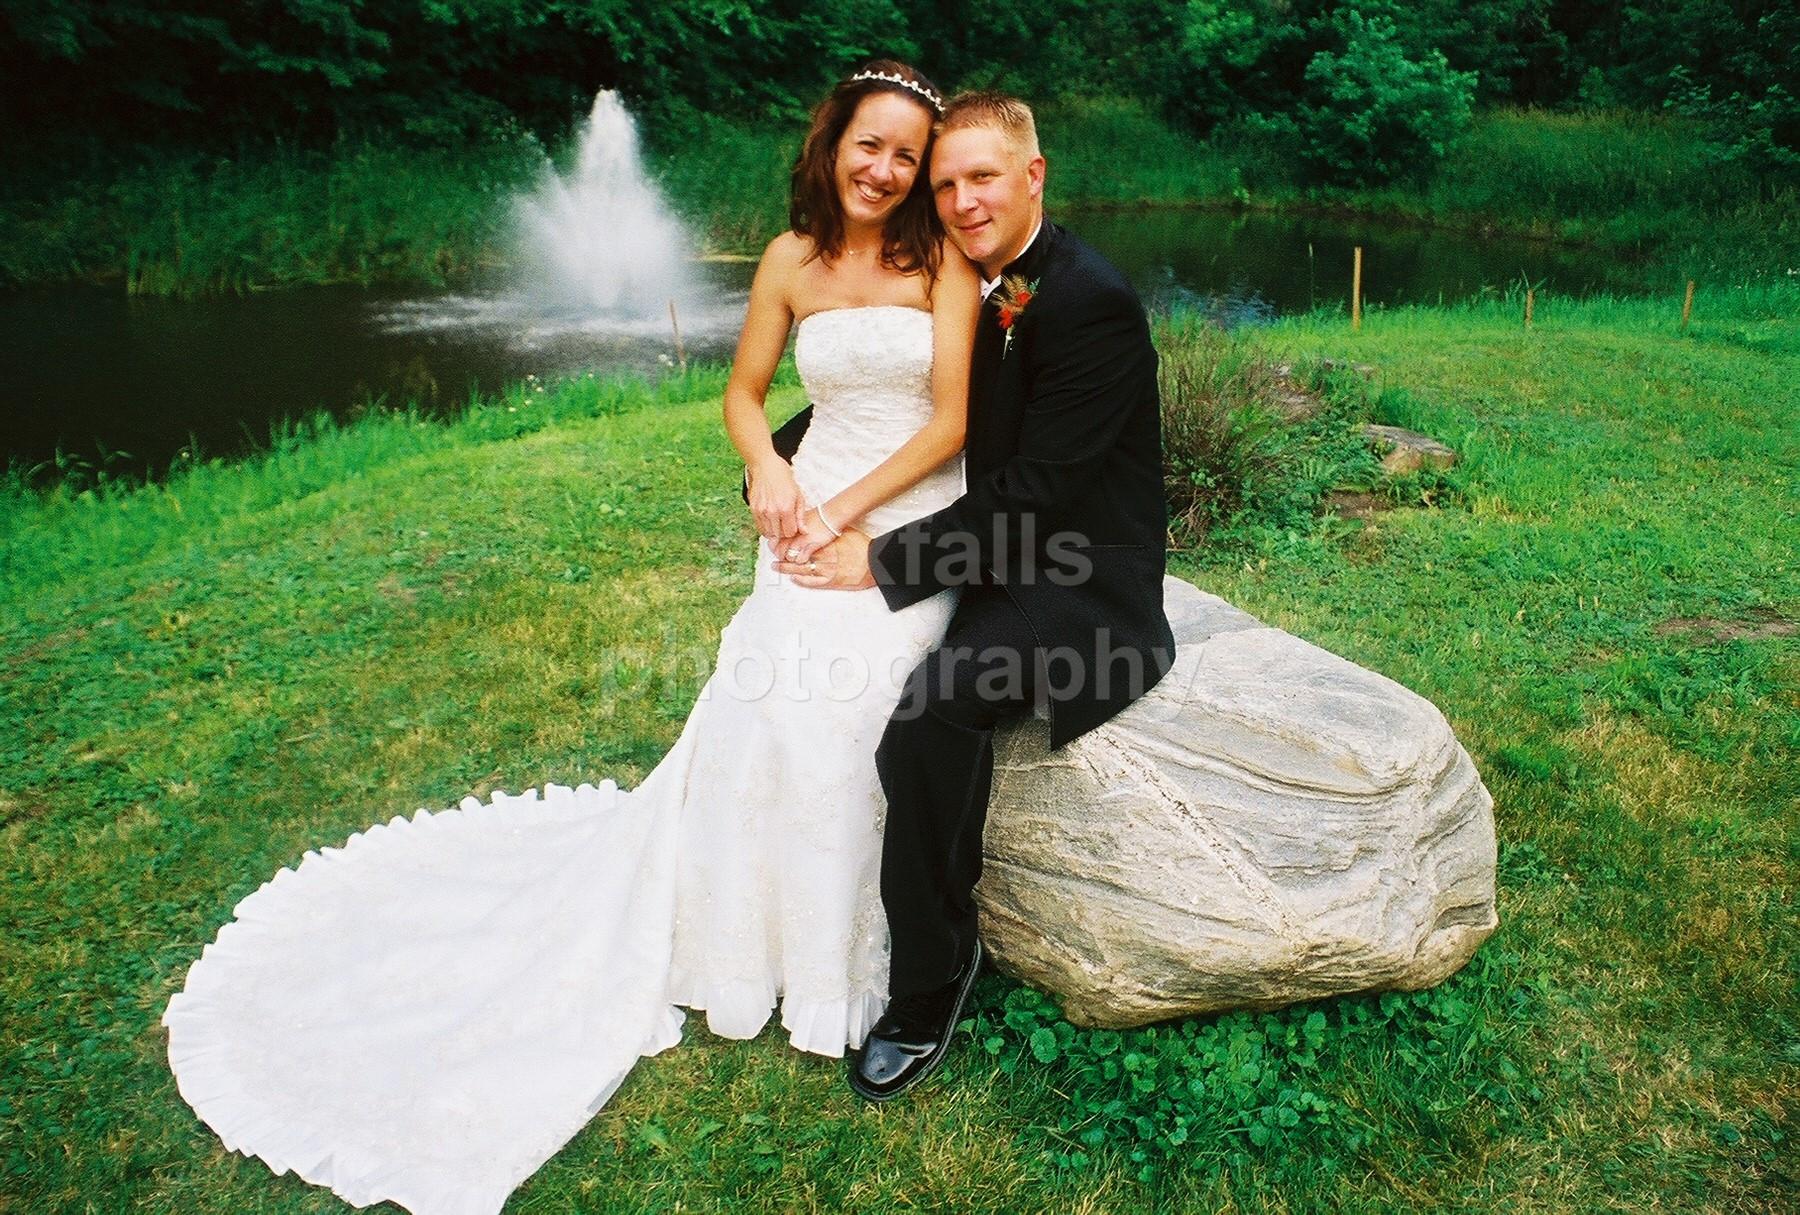 Weddings & Commitment Ceremonies